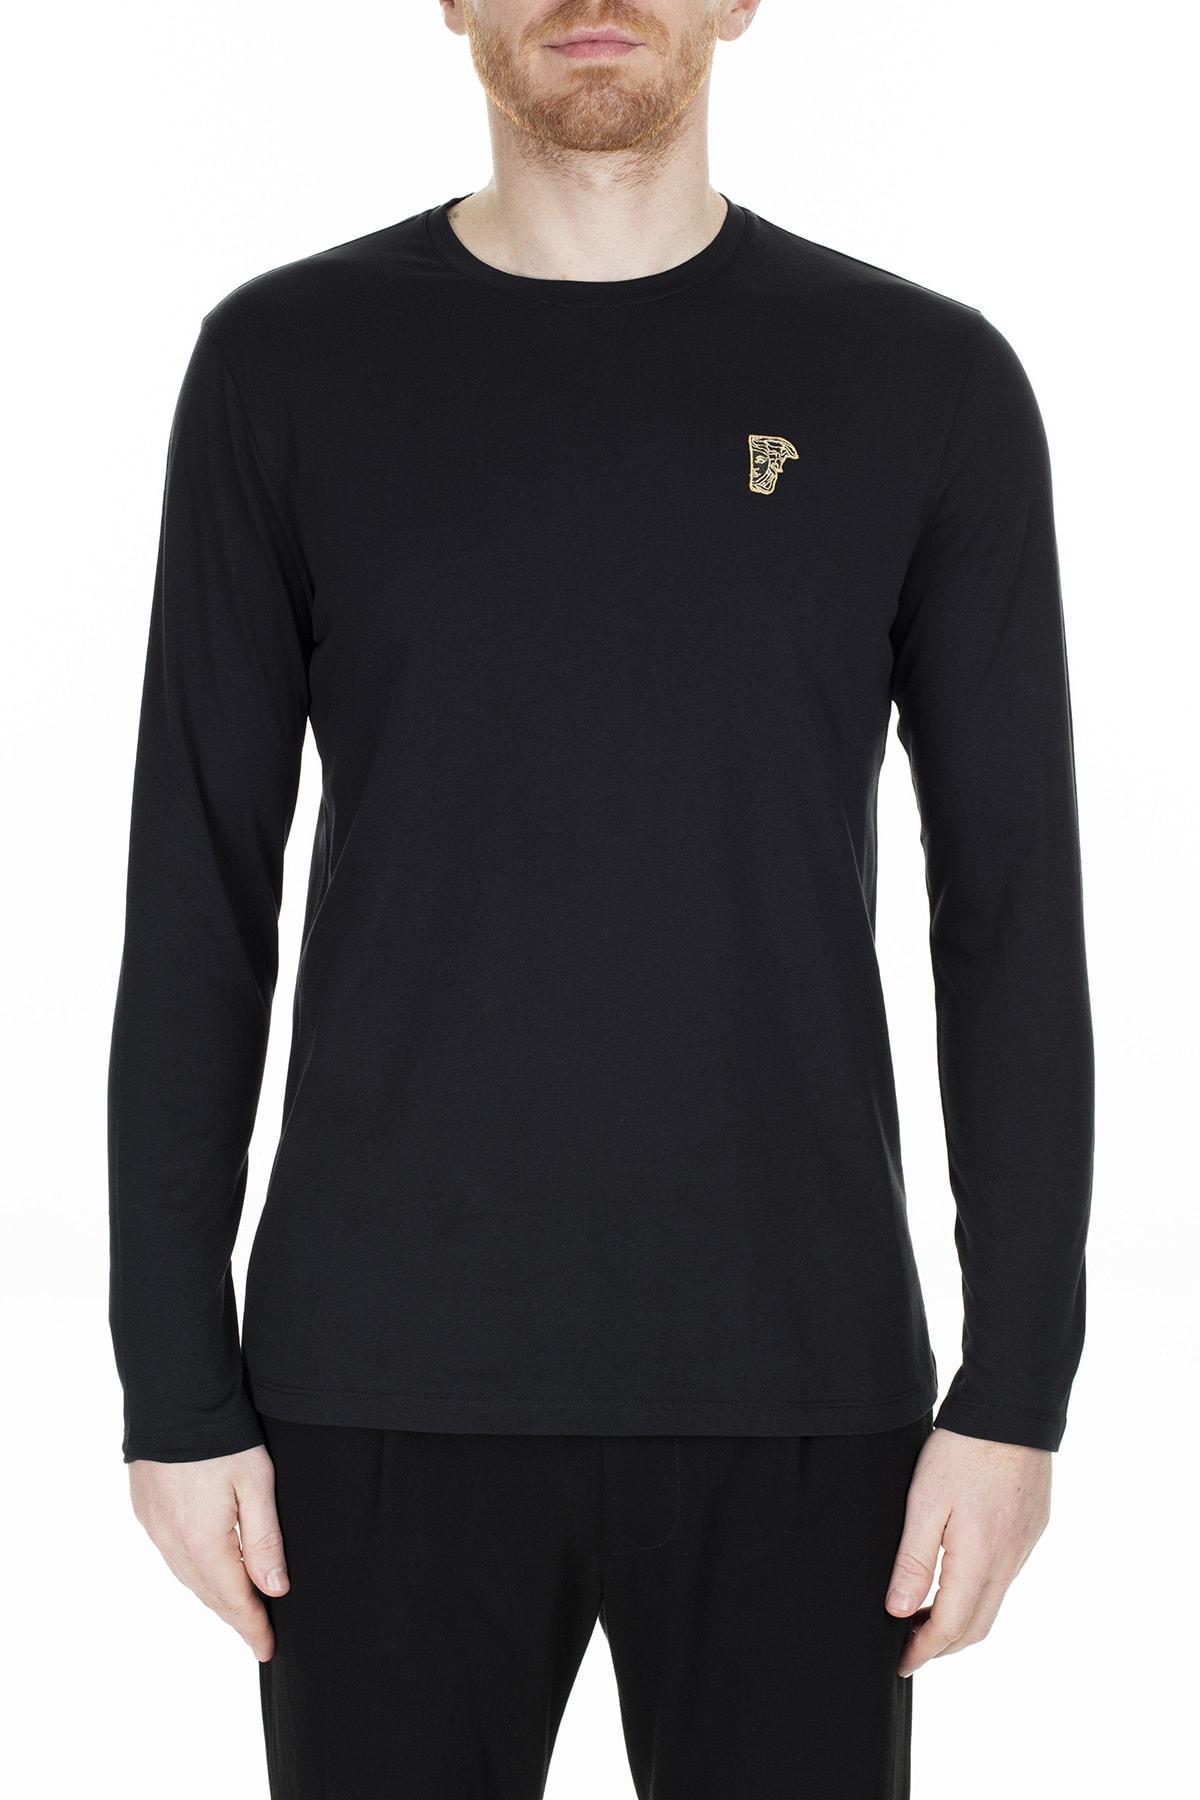 VERSACE COLLECTION Erkek Siyah Sweatshirt V800491R Vj00180 V9001